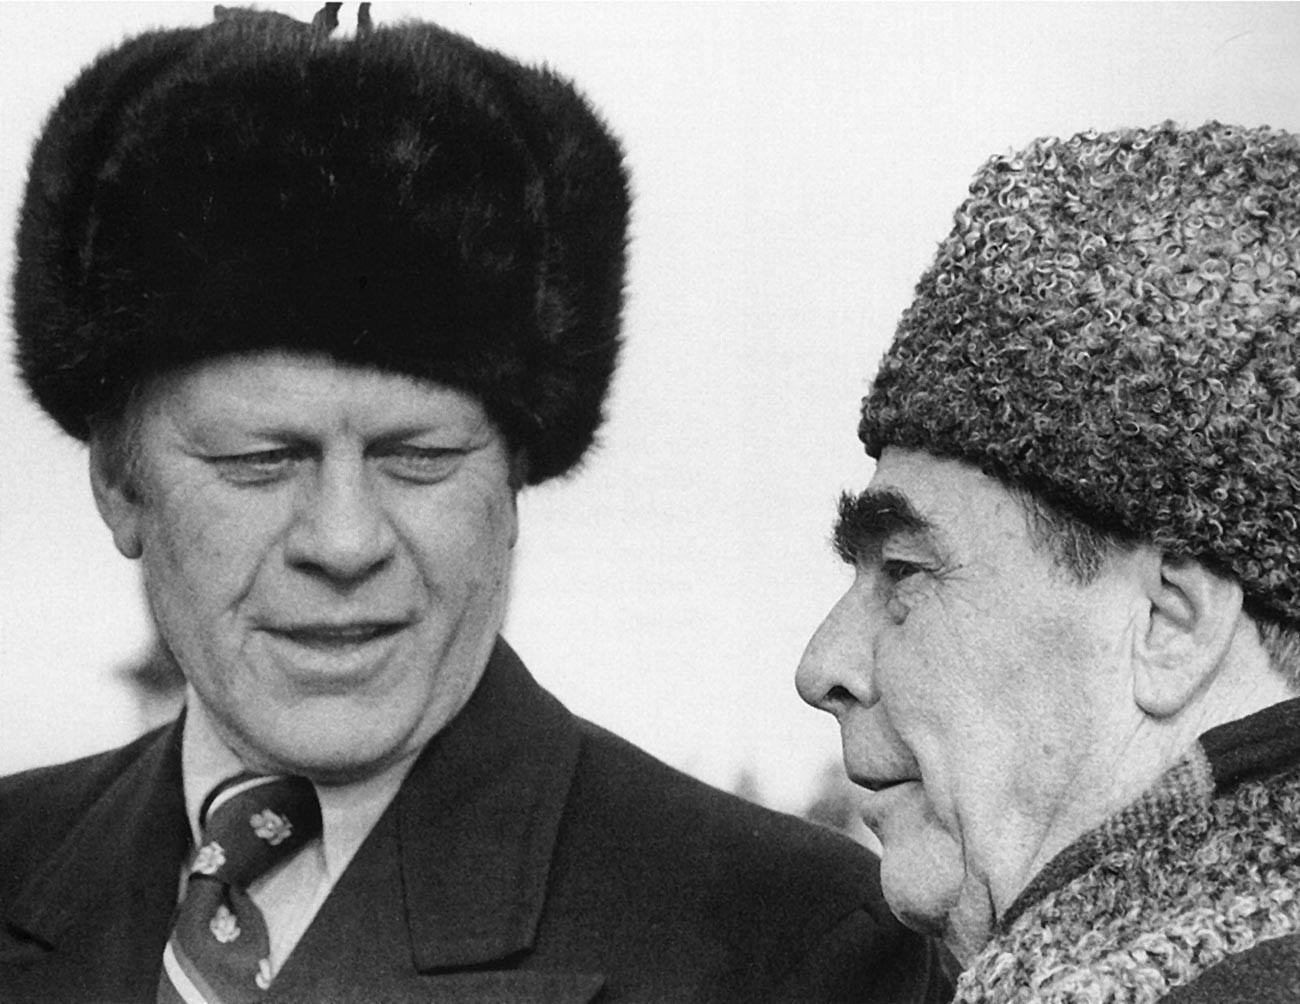 The U.S. President Gerald R. Ford meeting Soviet leader Leonid Brezhnev in Vladivostok, 1974